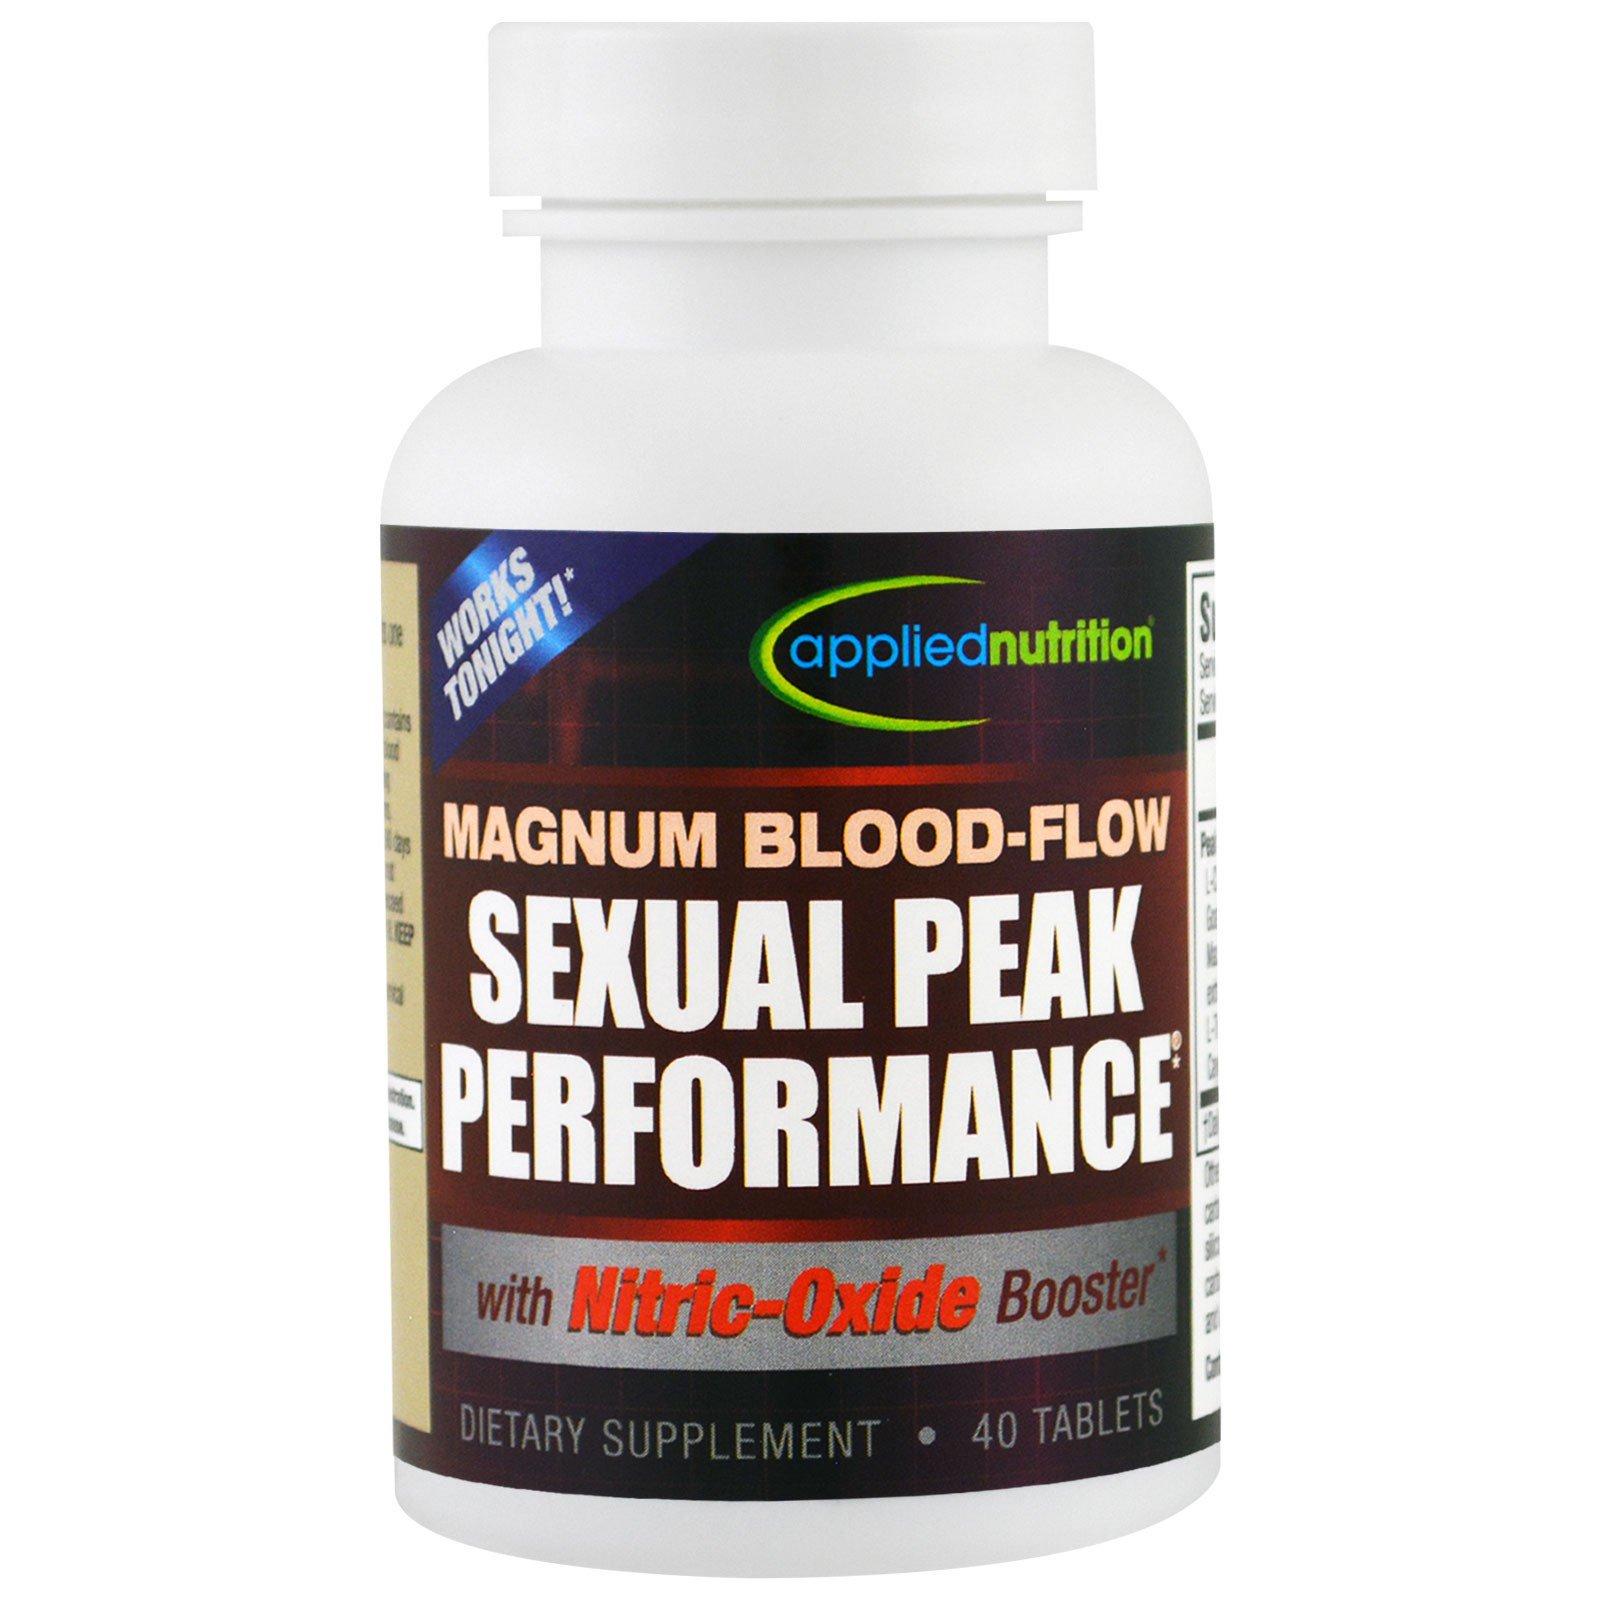 Applied nutrition sexual peak